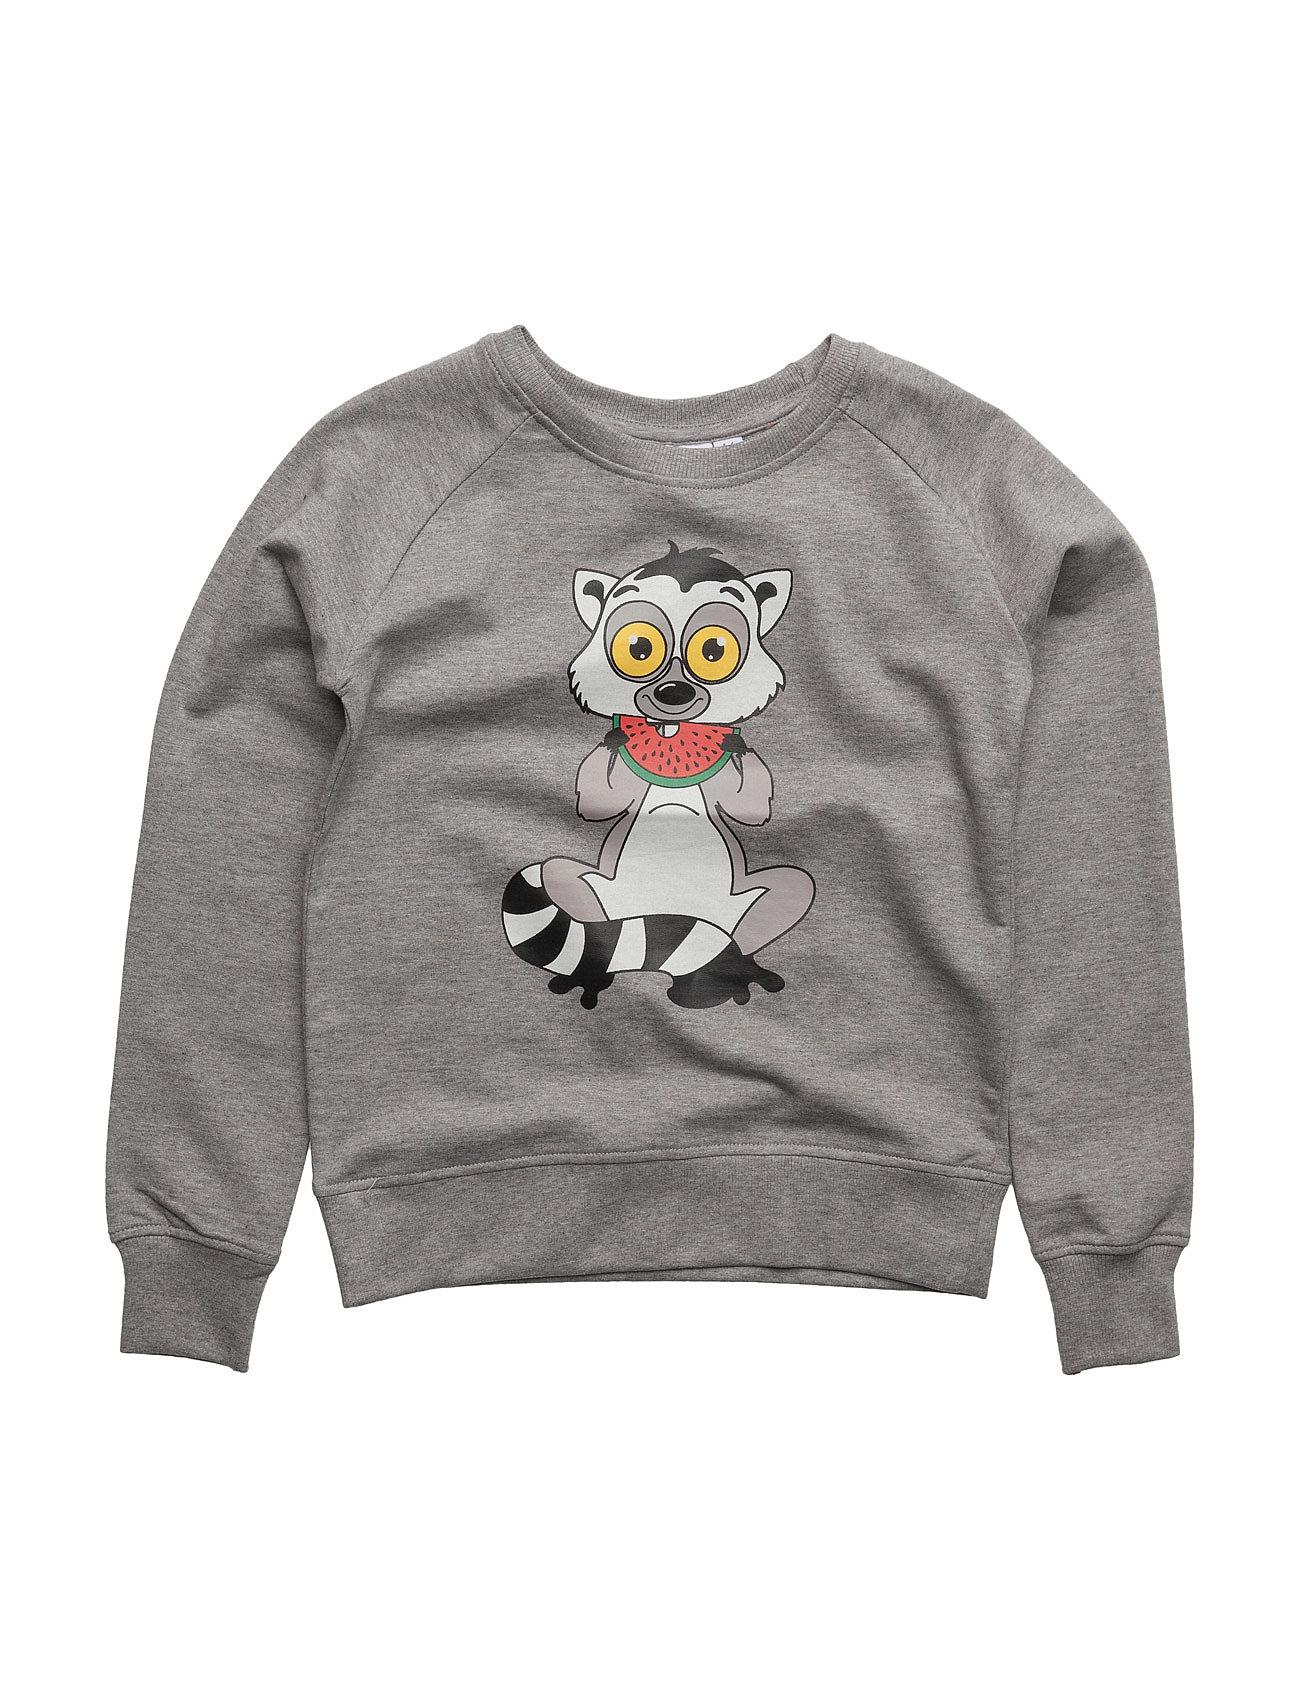 tao & friends Sweatshirt lemuren single-animal grey på boozt.com dk